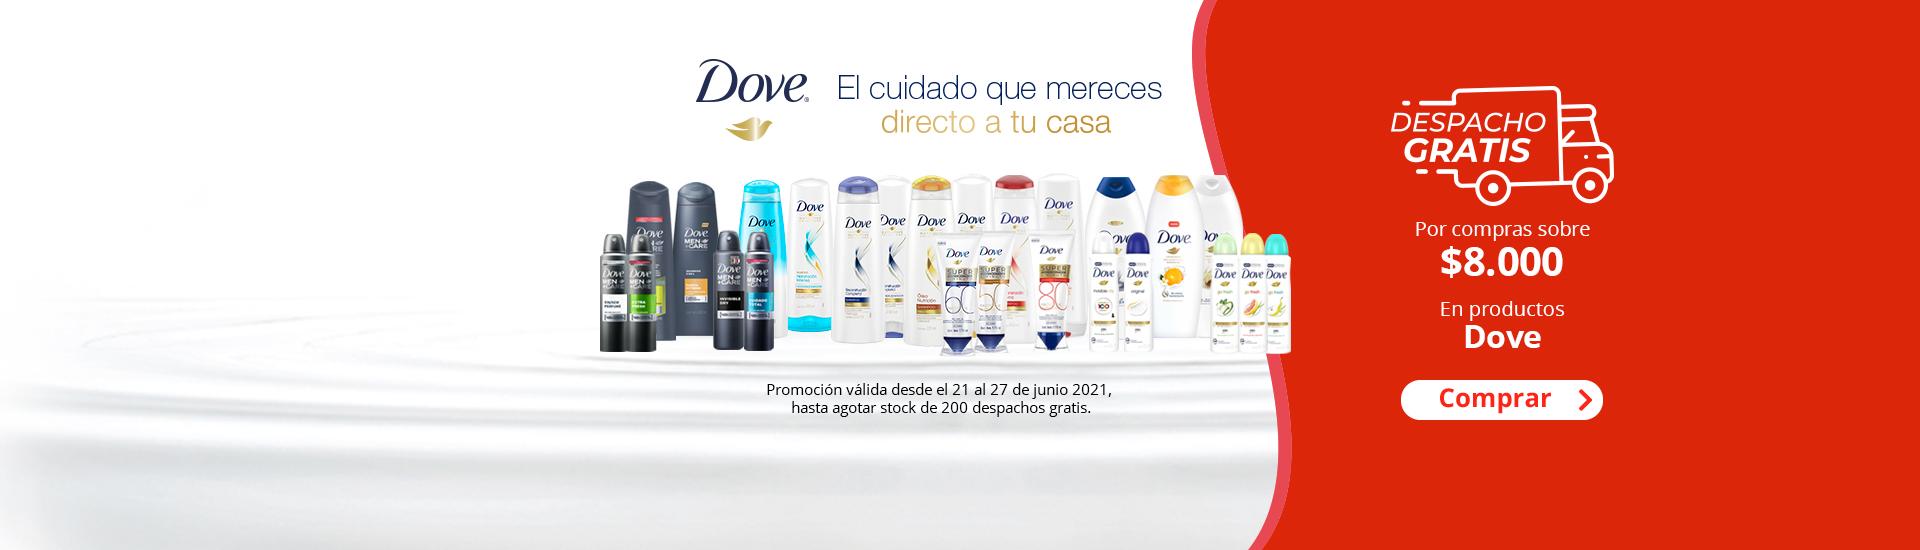 DG Alimentos Unilever